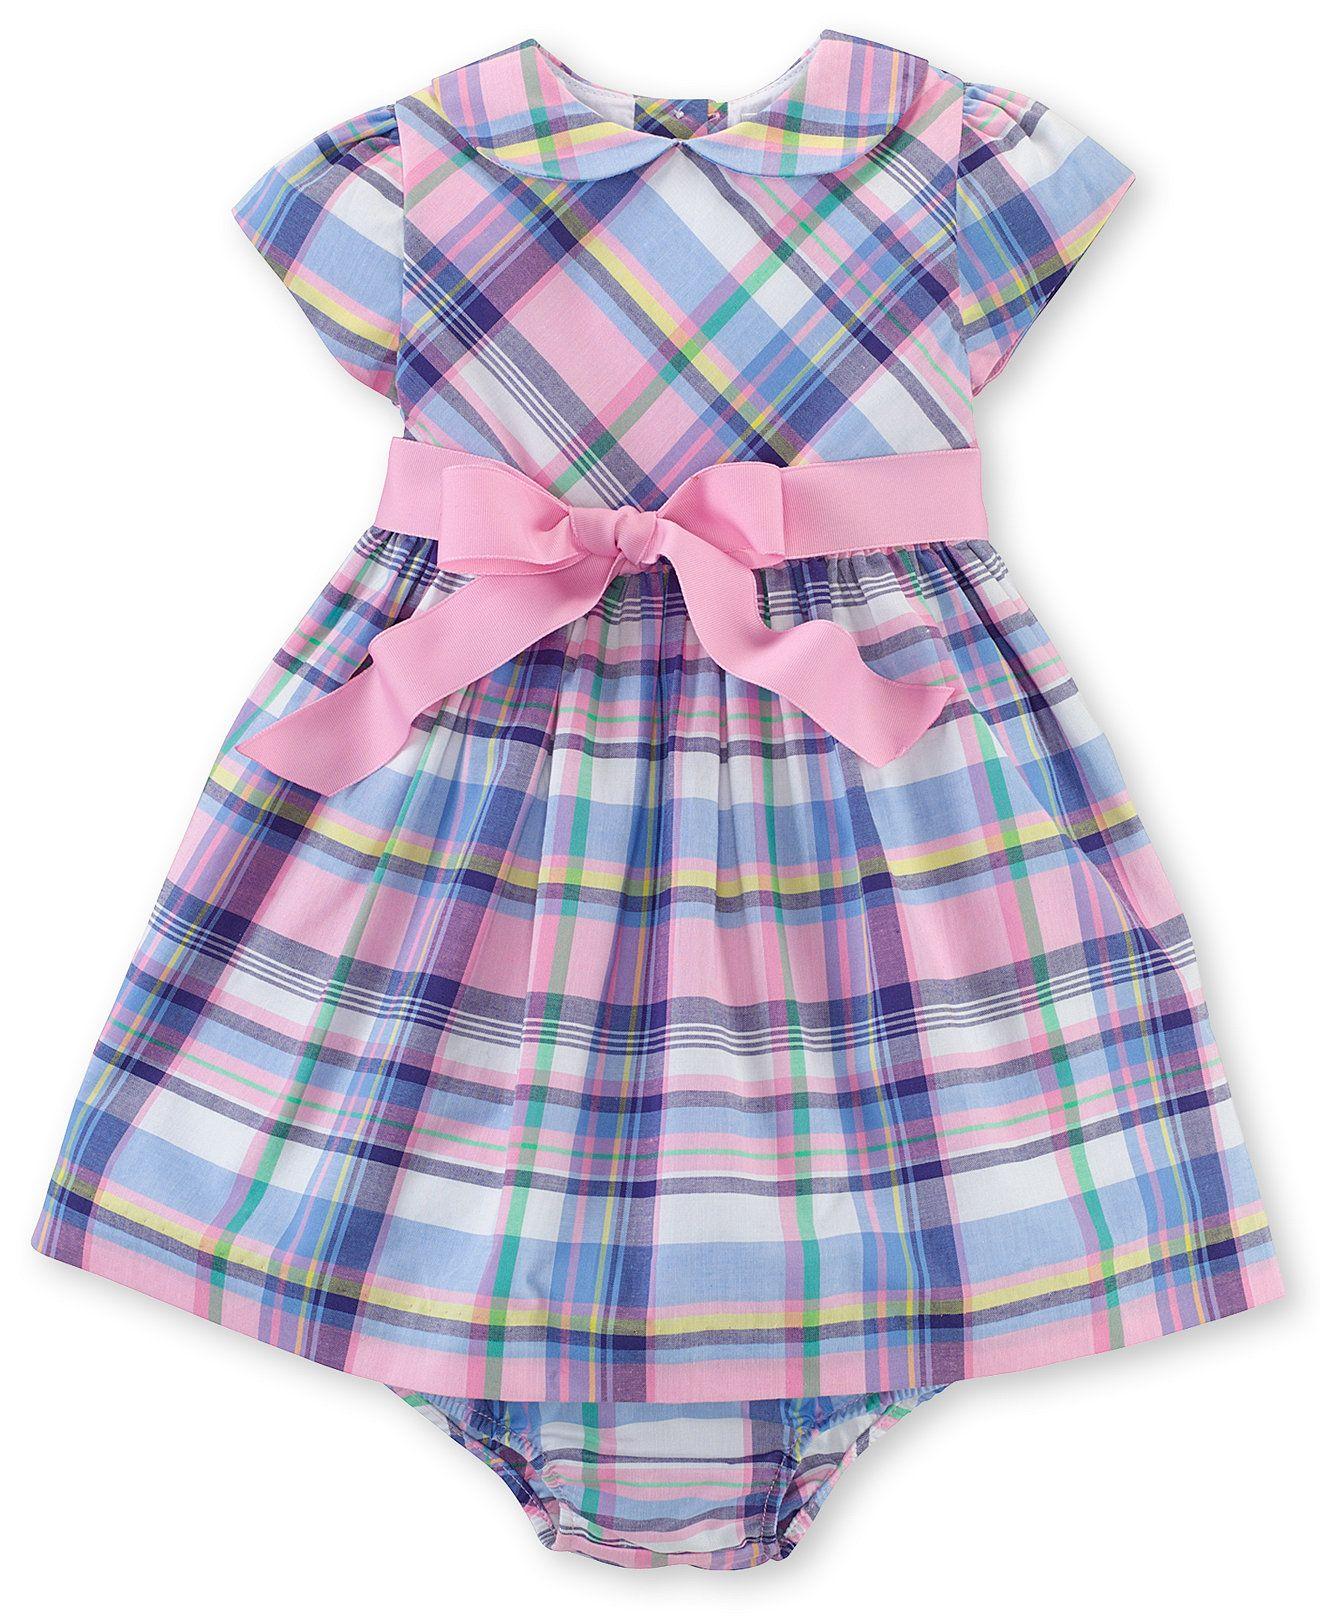 8acc1c84a6 Ralph Lauren Baby Girls' Belted Madras Dress - Kids Baby Girl (0-24 ...